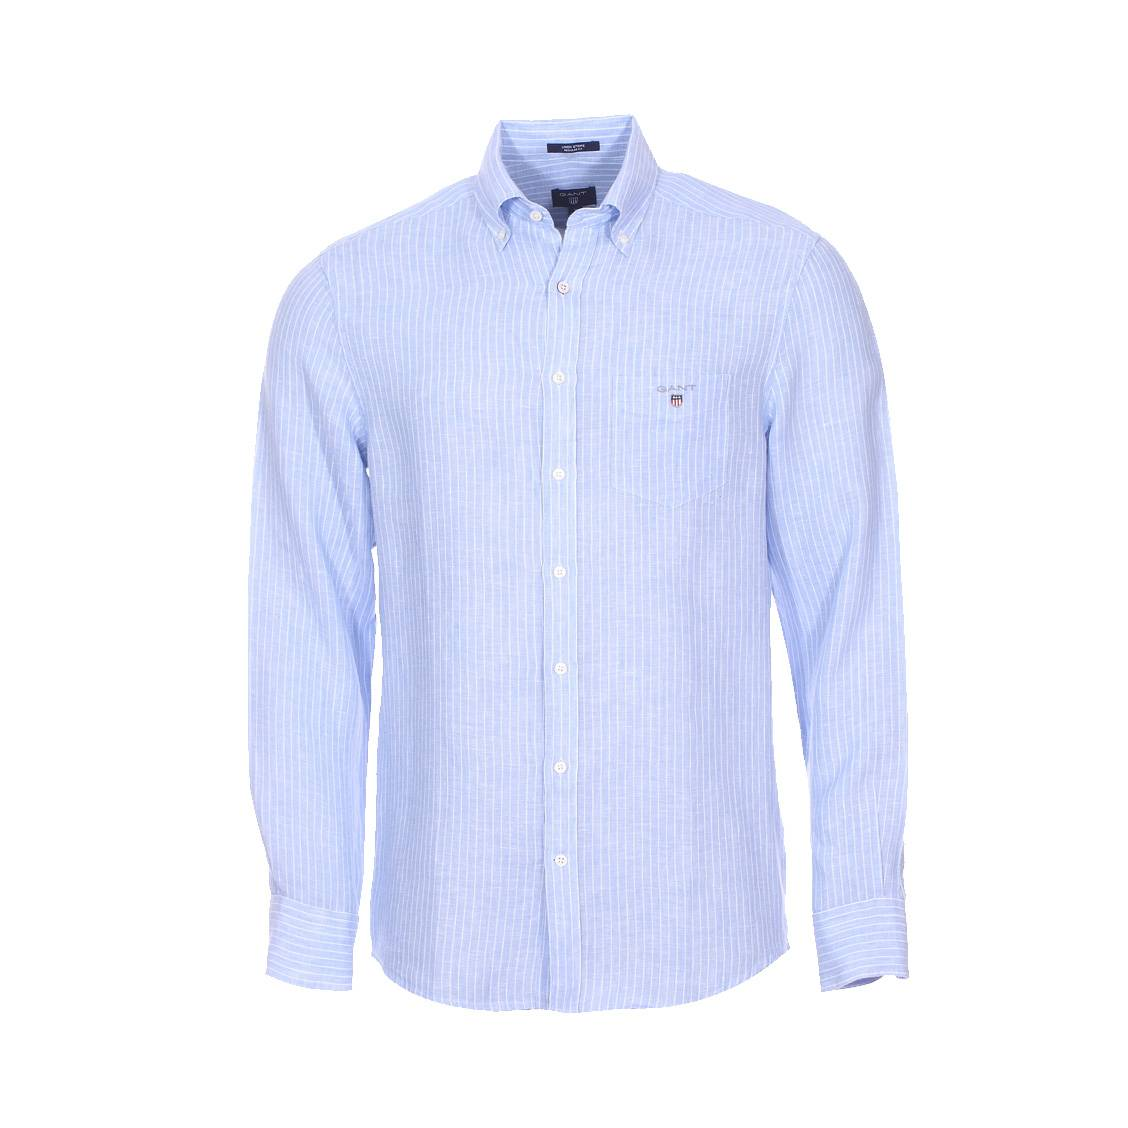 chemise droite gant en lin bleu ciel rayures blanches rue des hommes. Black Bedroom Furniture Sets. Home Design Ideas